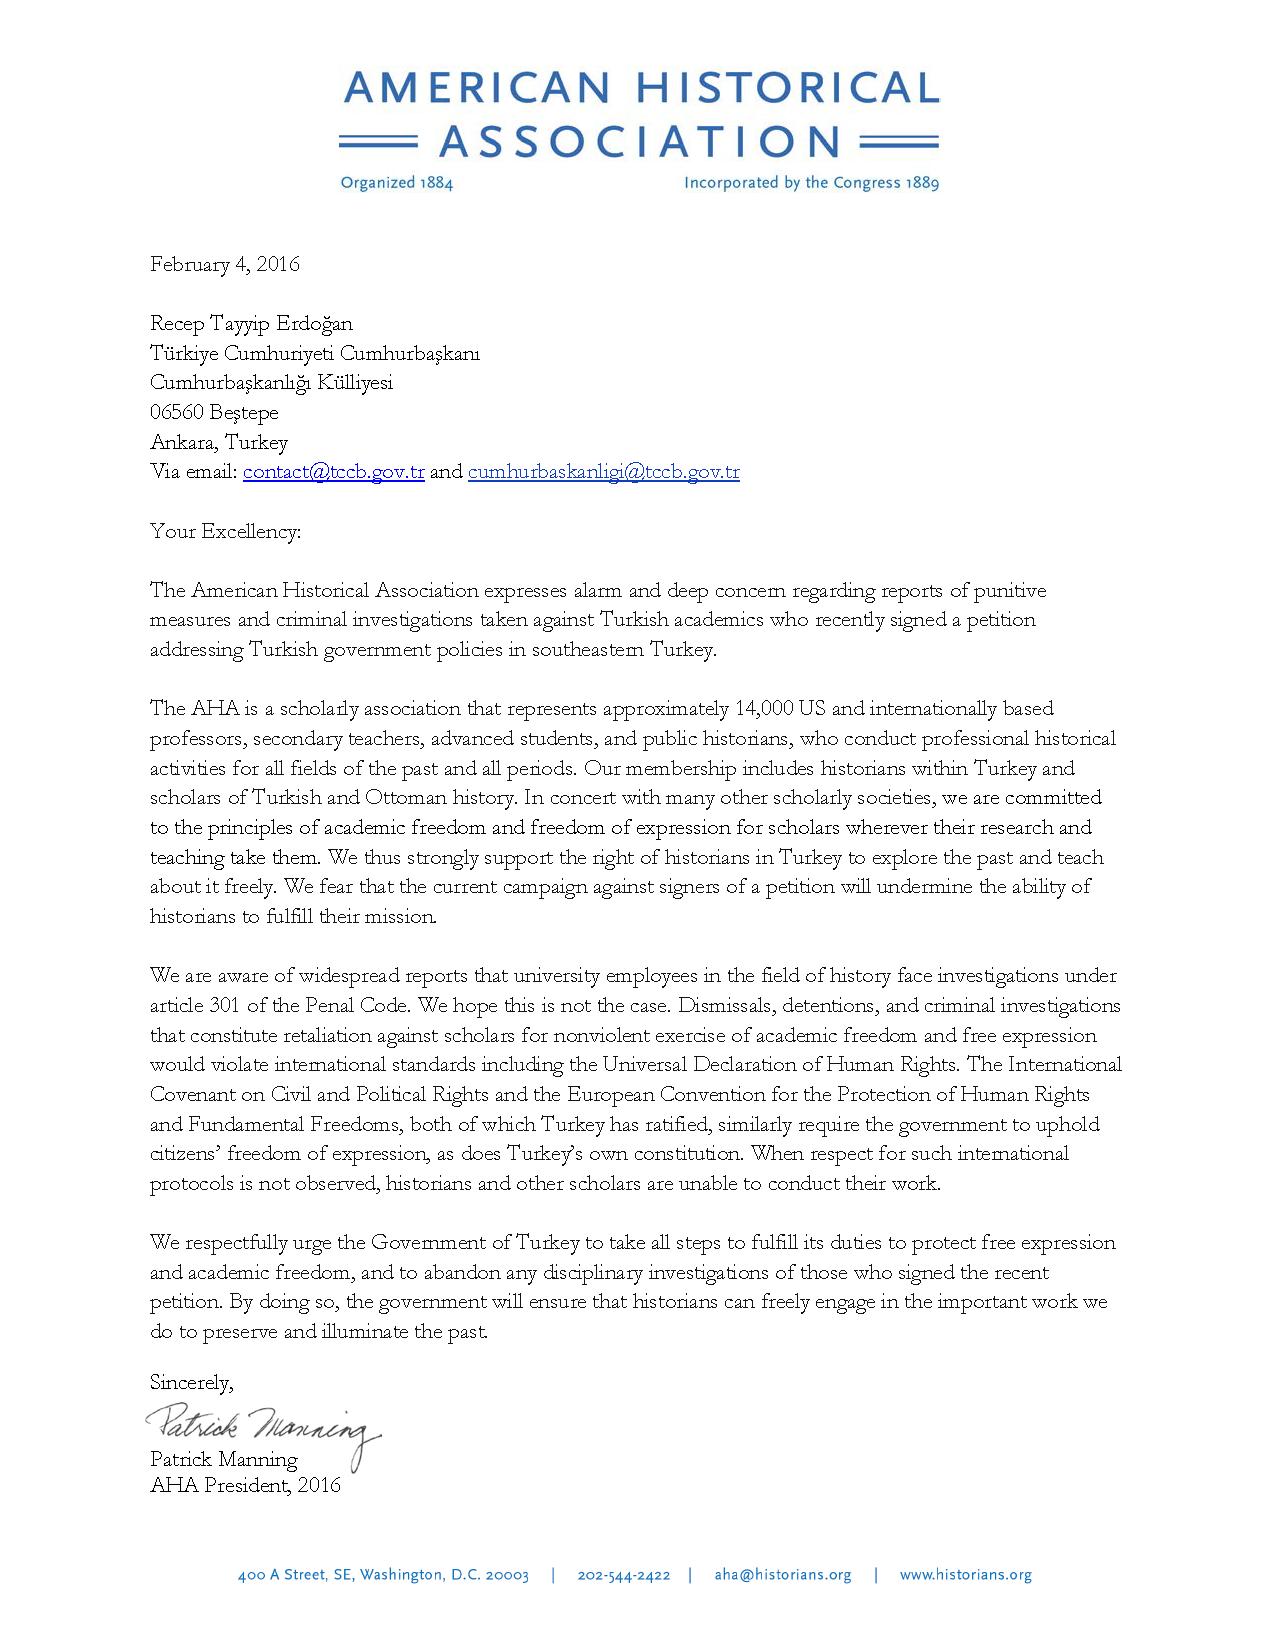 Letter of Concern Regarding Reports of Punitive Measures ...